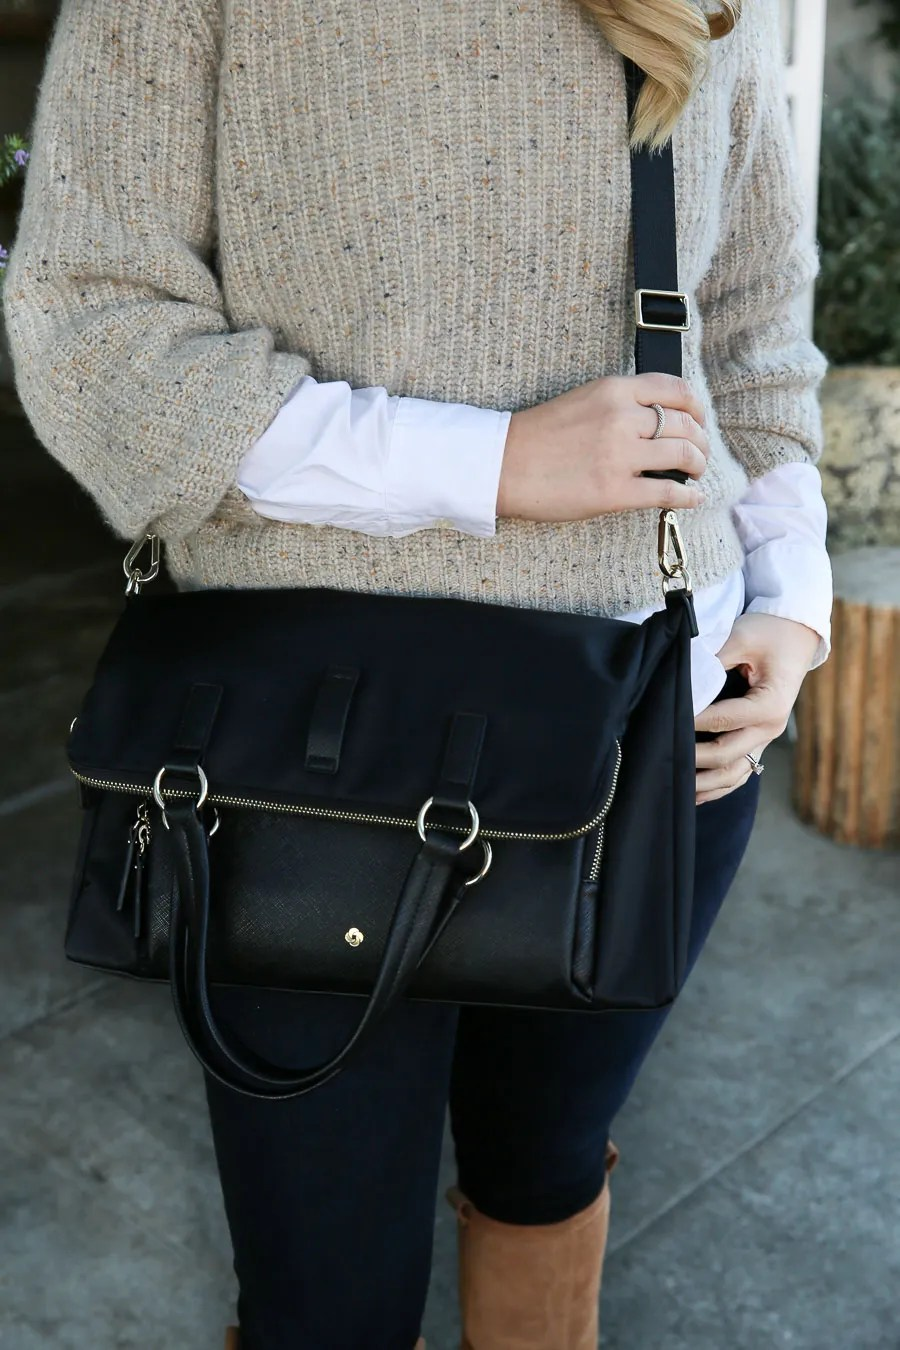 Samsonite Handbags Review - Encompass Convertible Crossbody